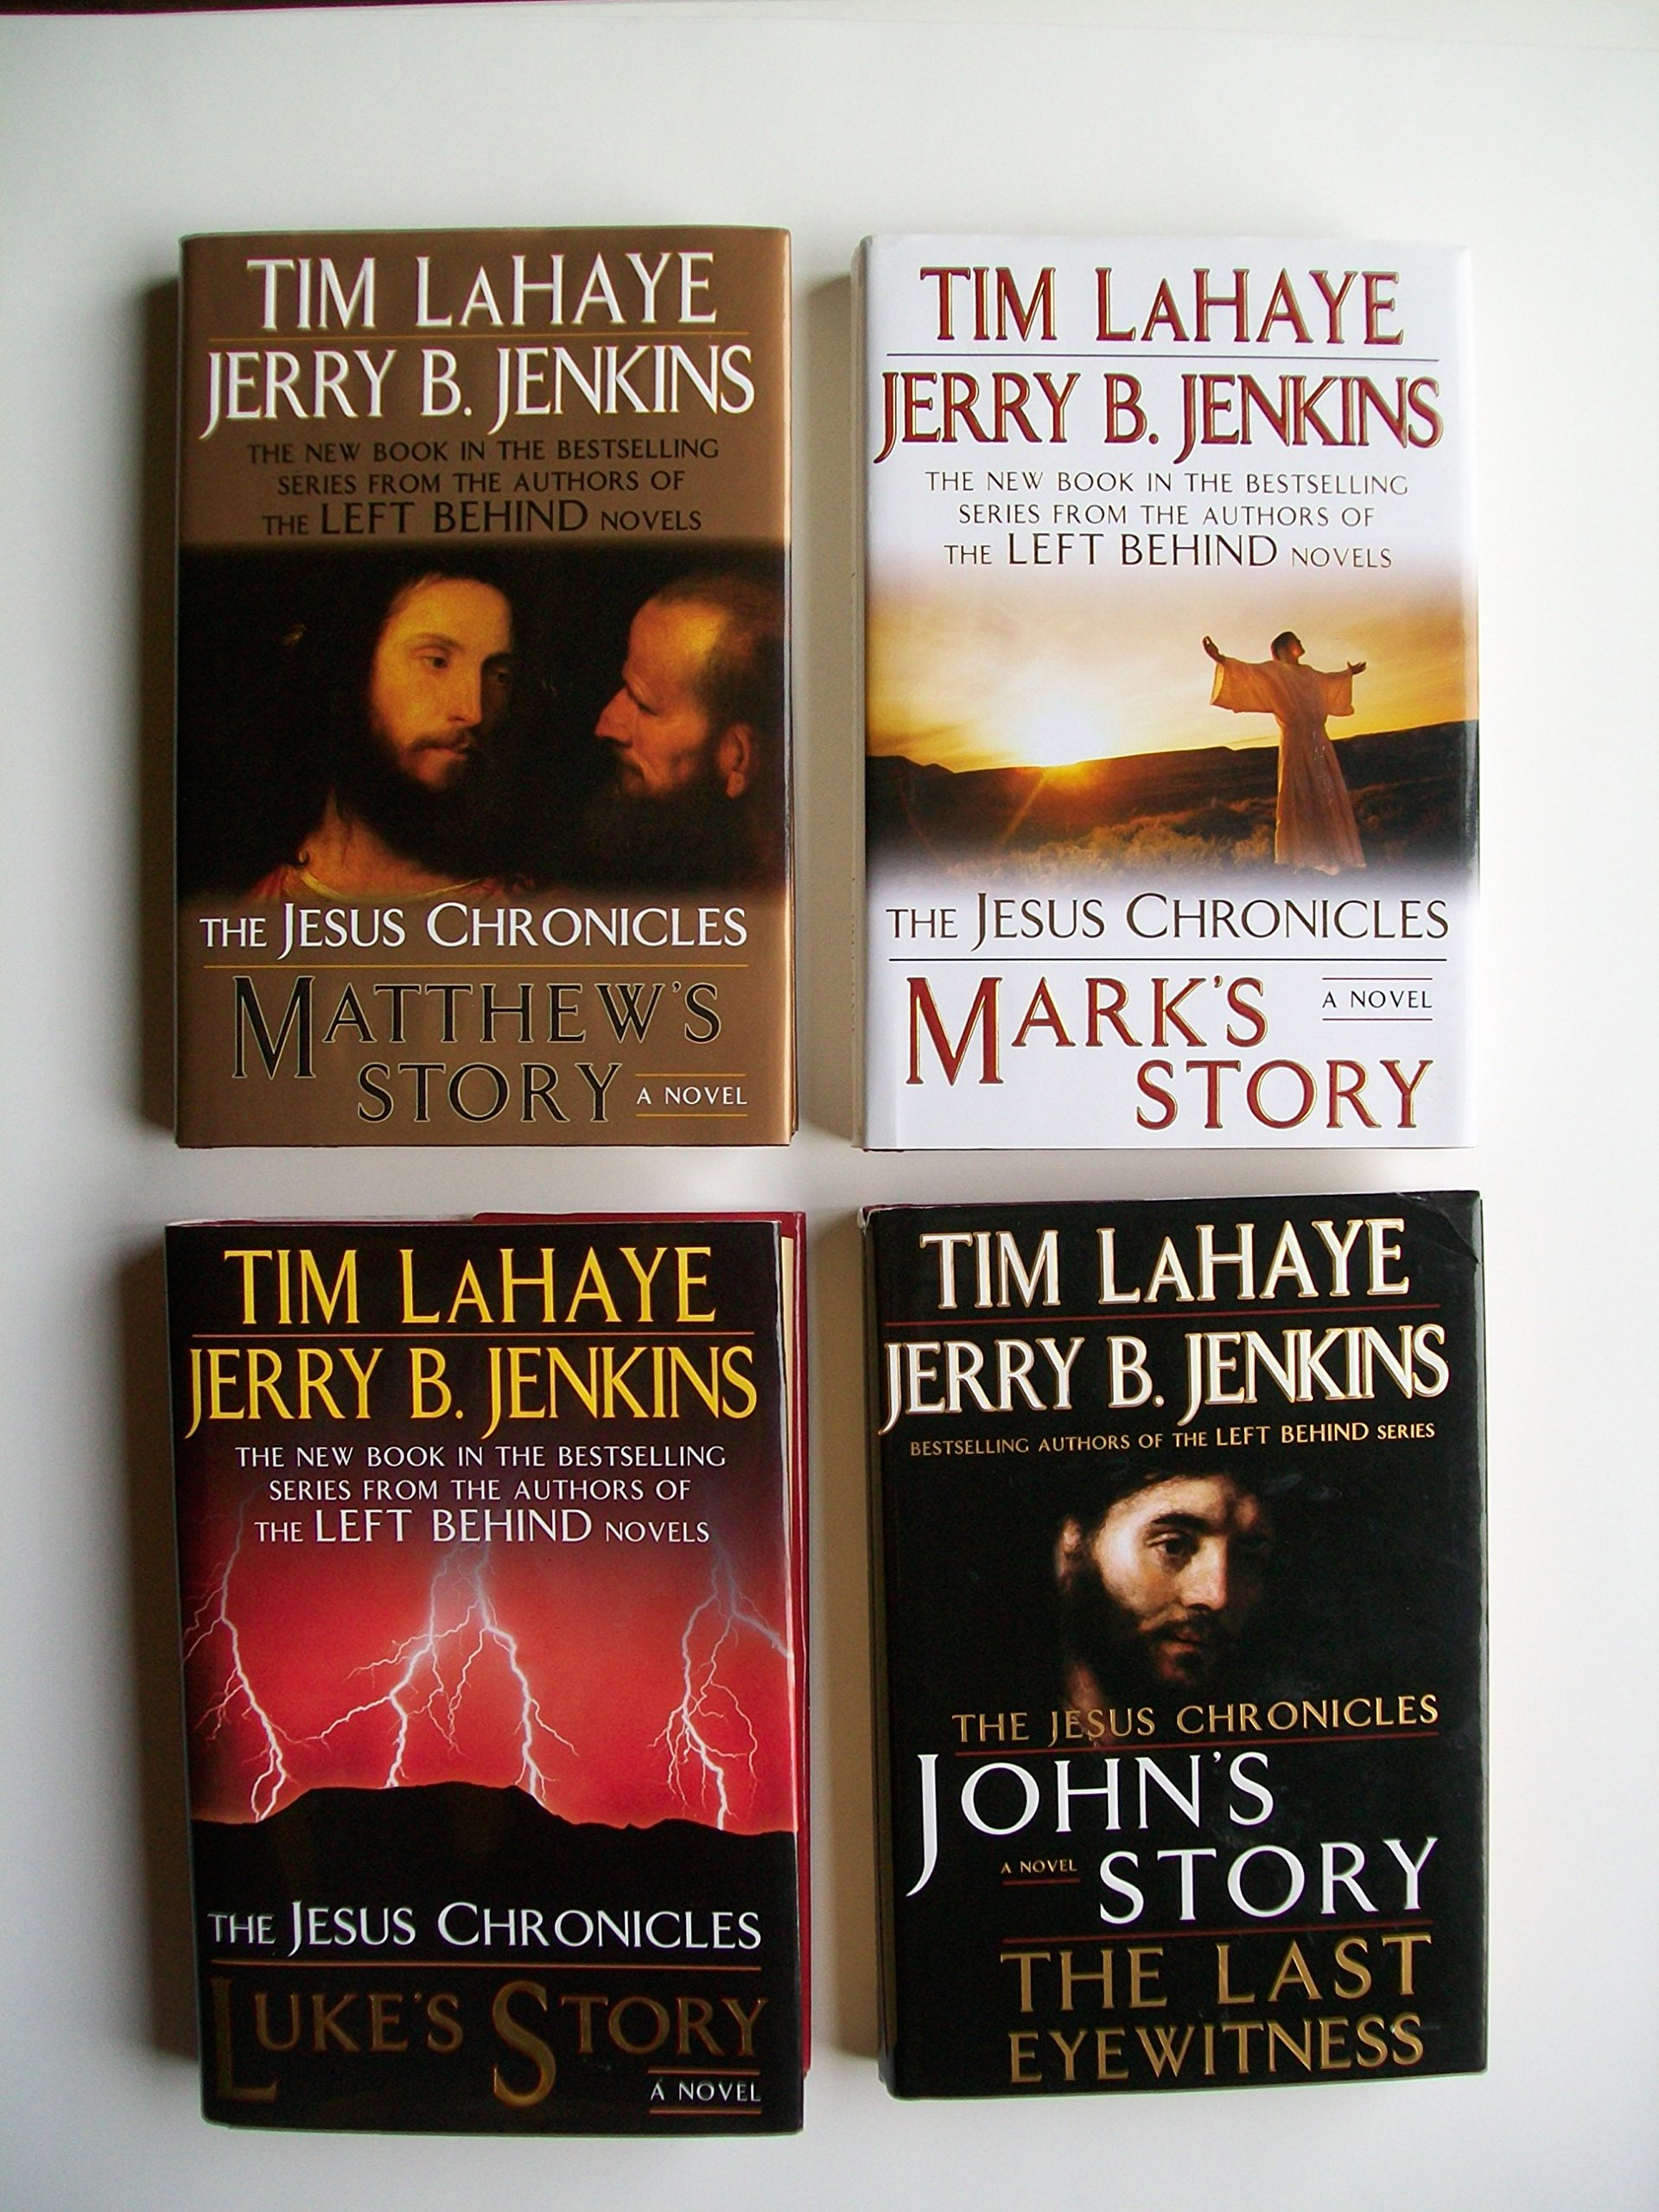 The Jesus Chronicles Set Of 4 Matthew S Story Mark S Story Luke S Story John S Story Tim Lahaye Jerry B Jenkins Books